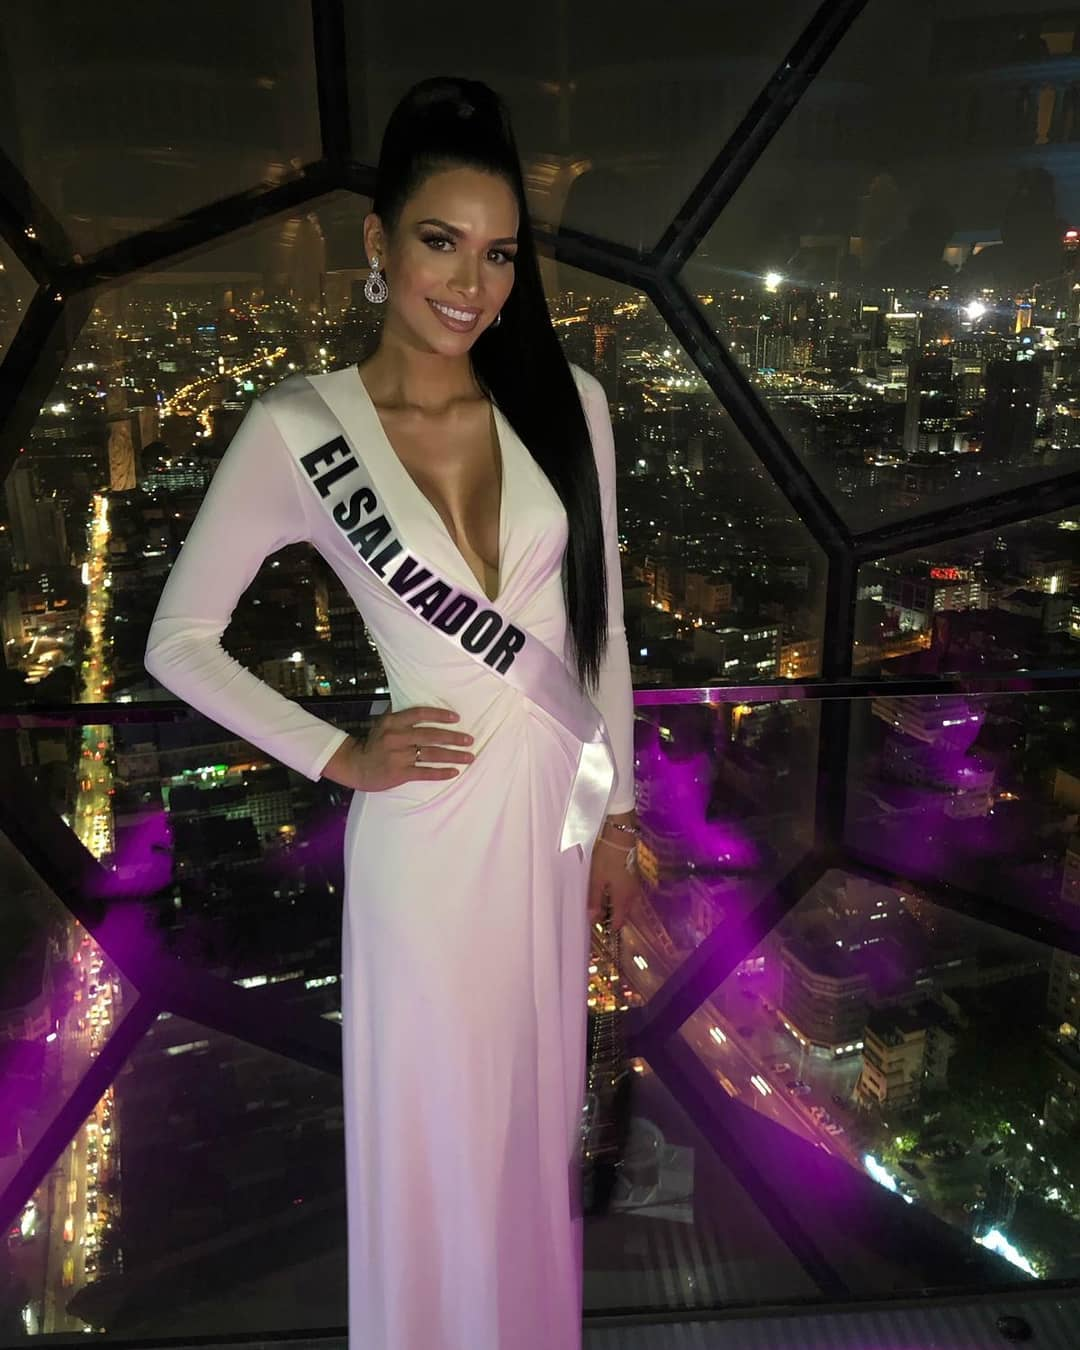 welcome dinner de candidatas a miss universe 2018. - Página 8 72dxc34k